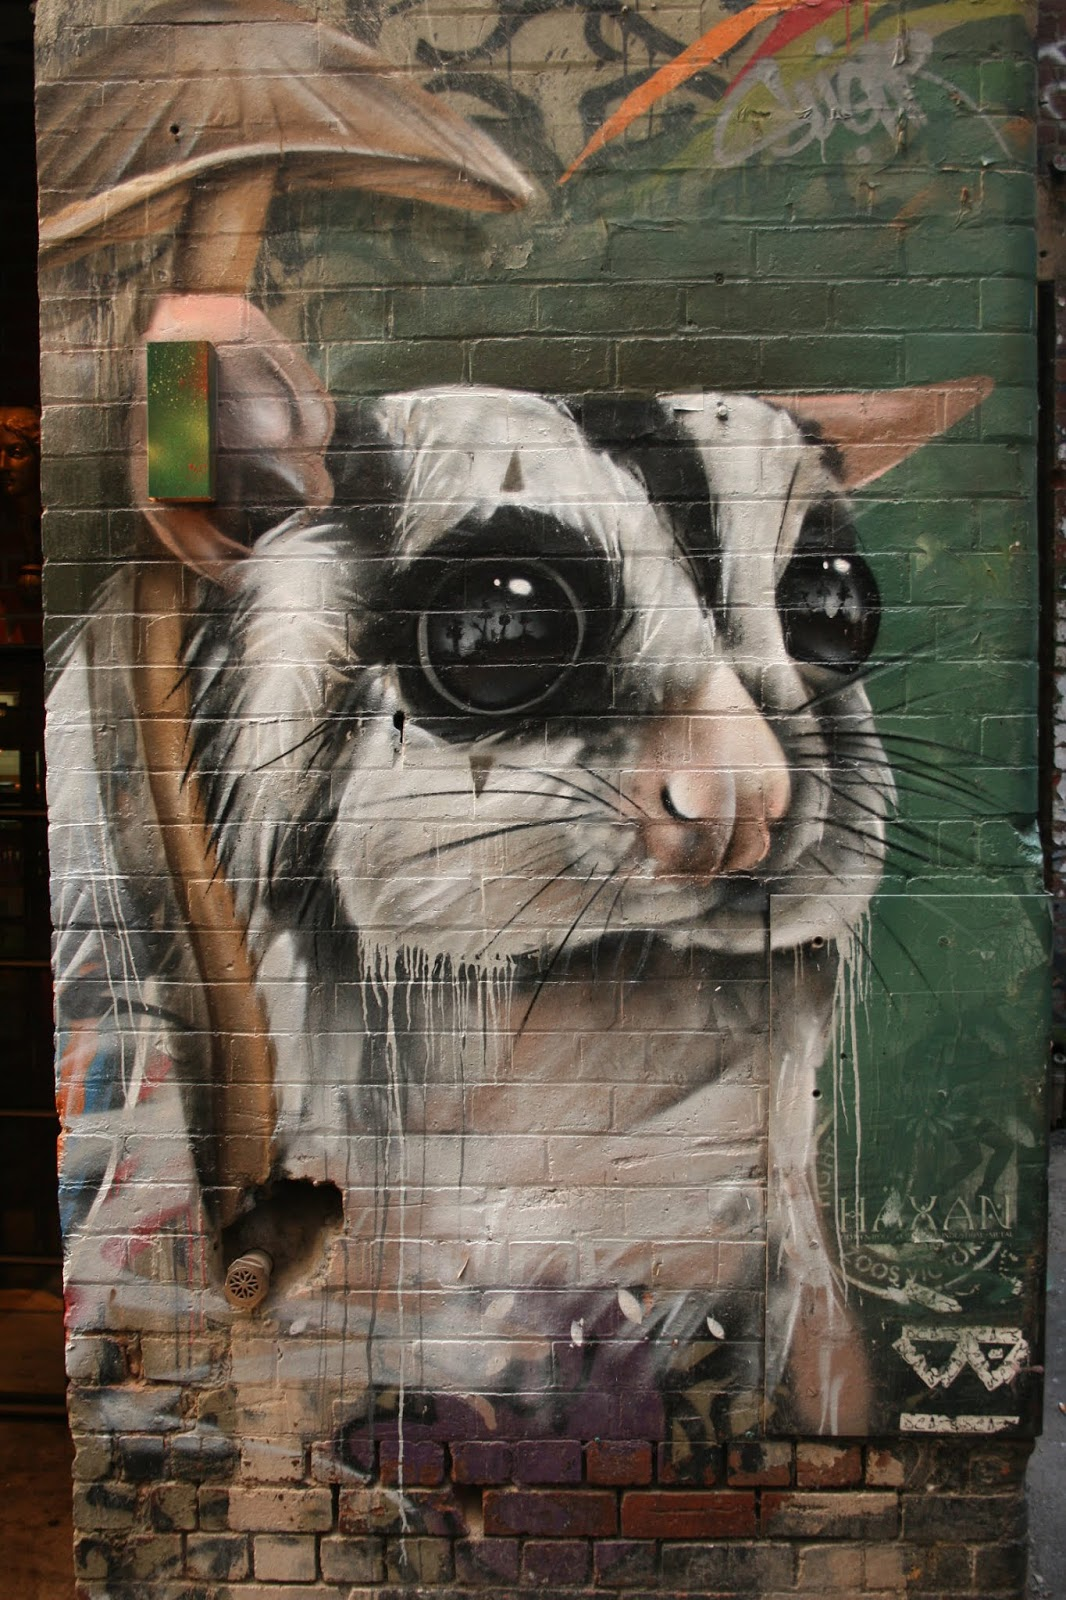 Street Art Melbourne 4 2018 Lushsux N2o Kambeeno Fintan Magee Sugar Phoenix Barek Ntb Drasko Graffitis Du Monde Street Art